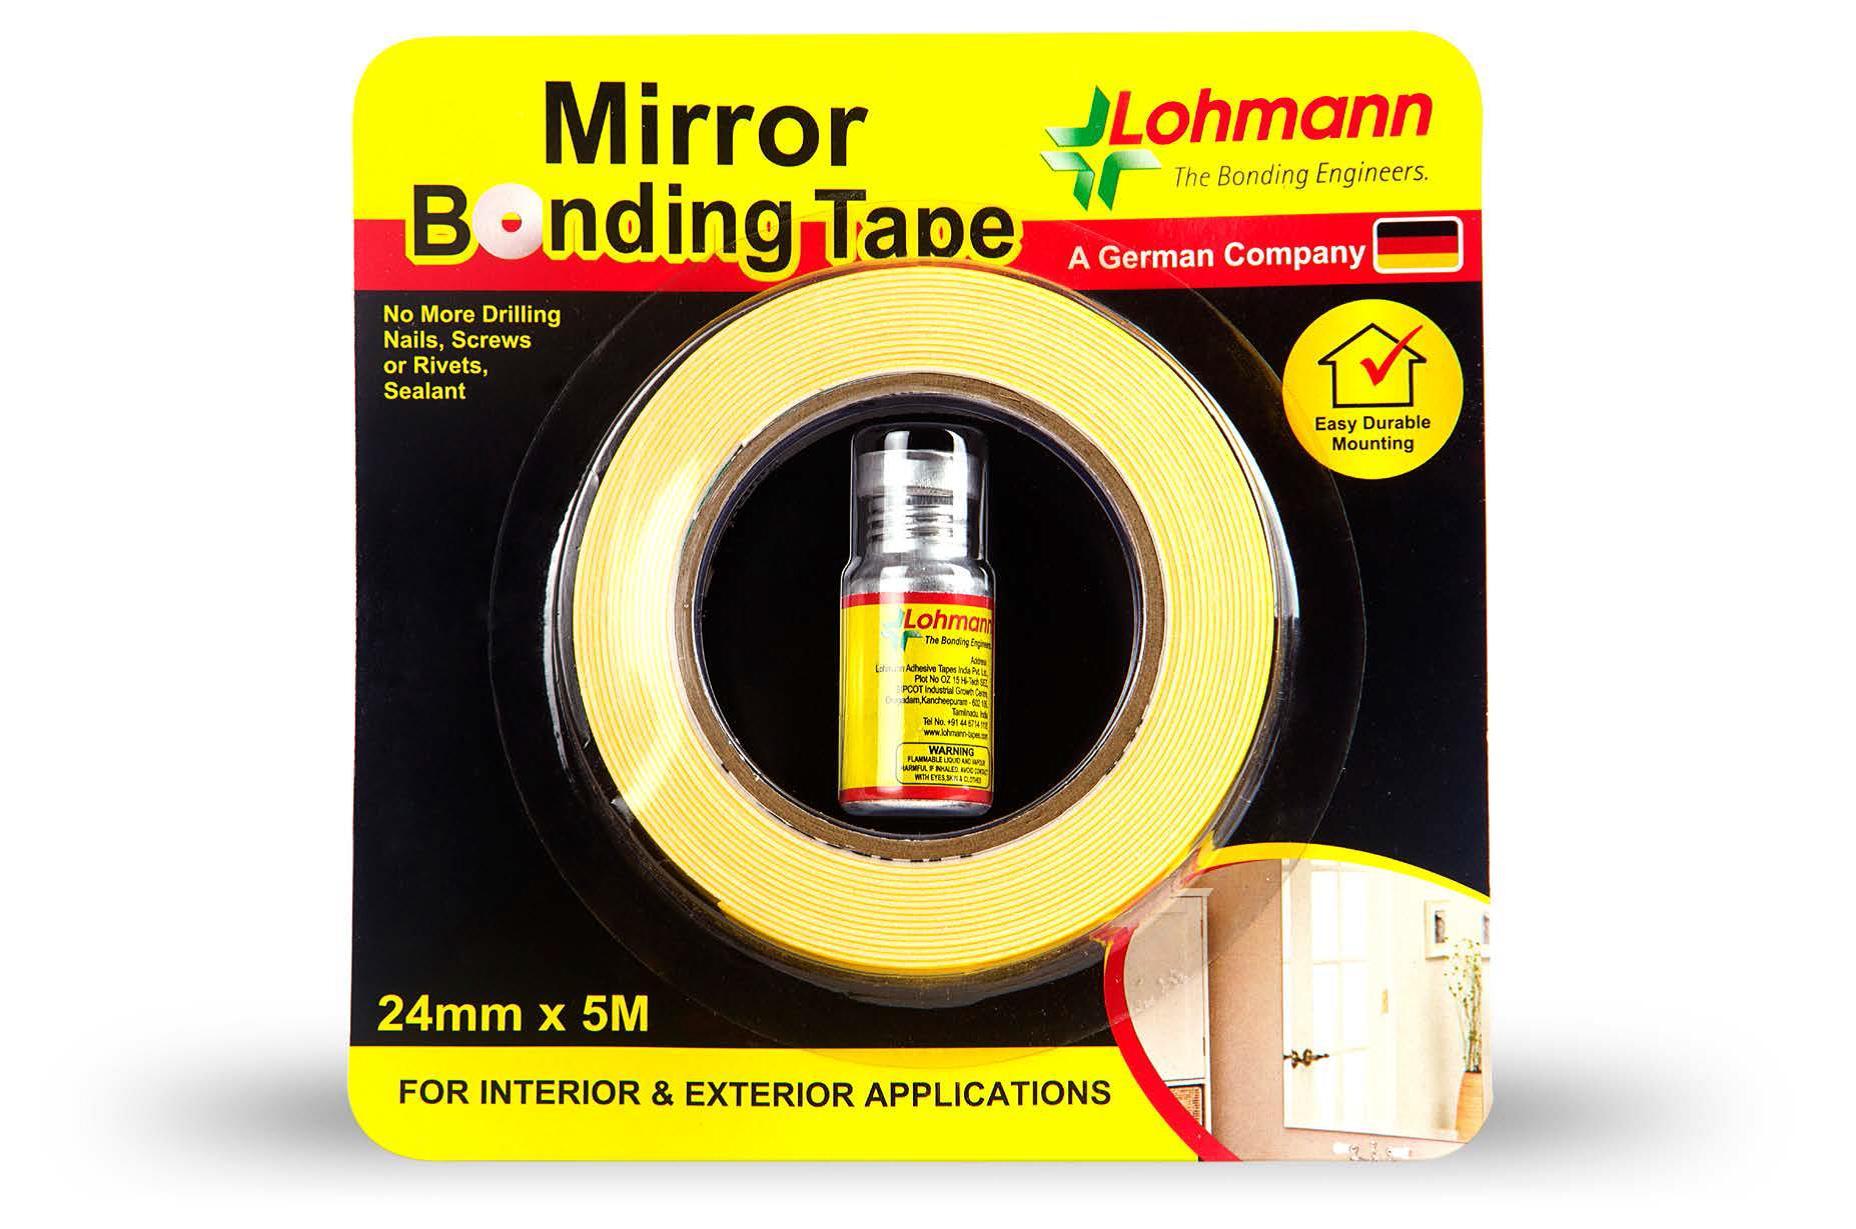 Lohmann Mirror Bonding Tape in coimbatore